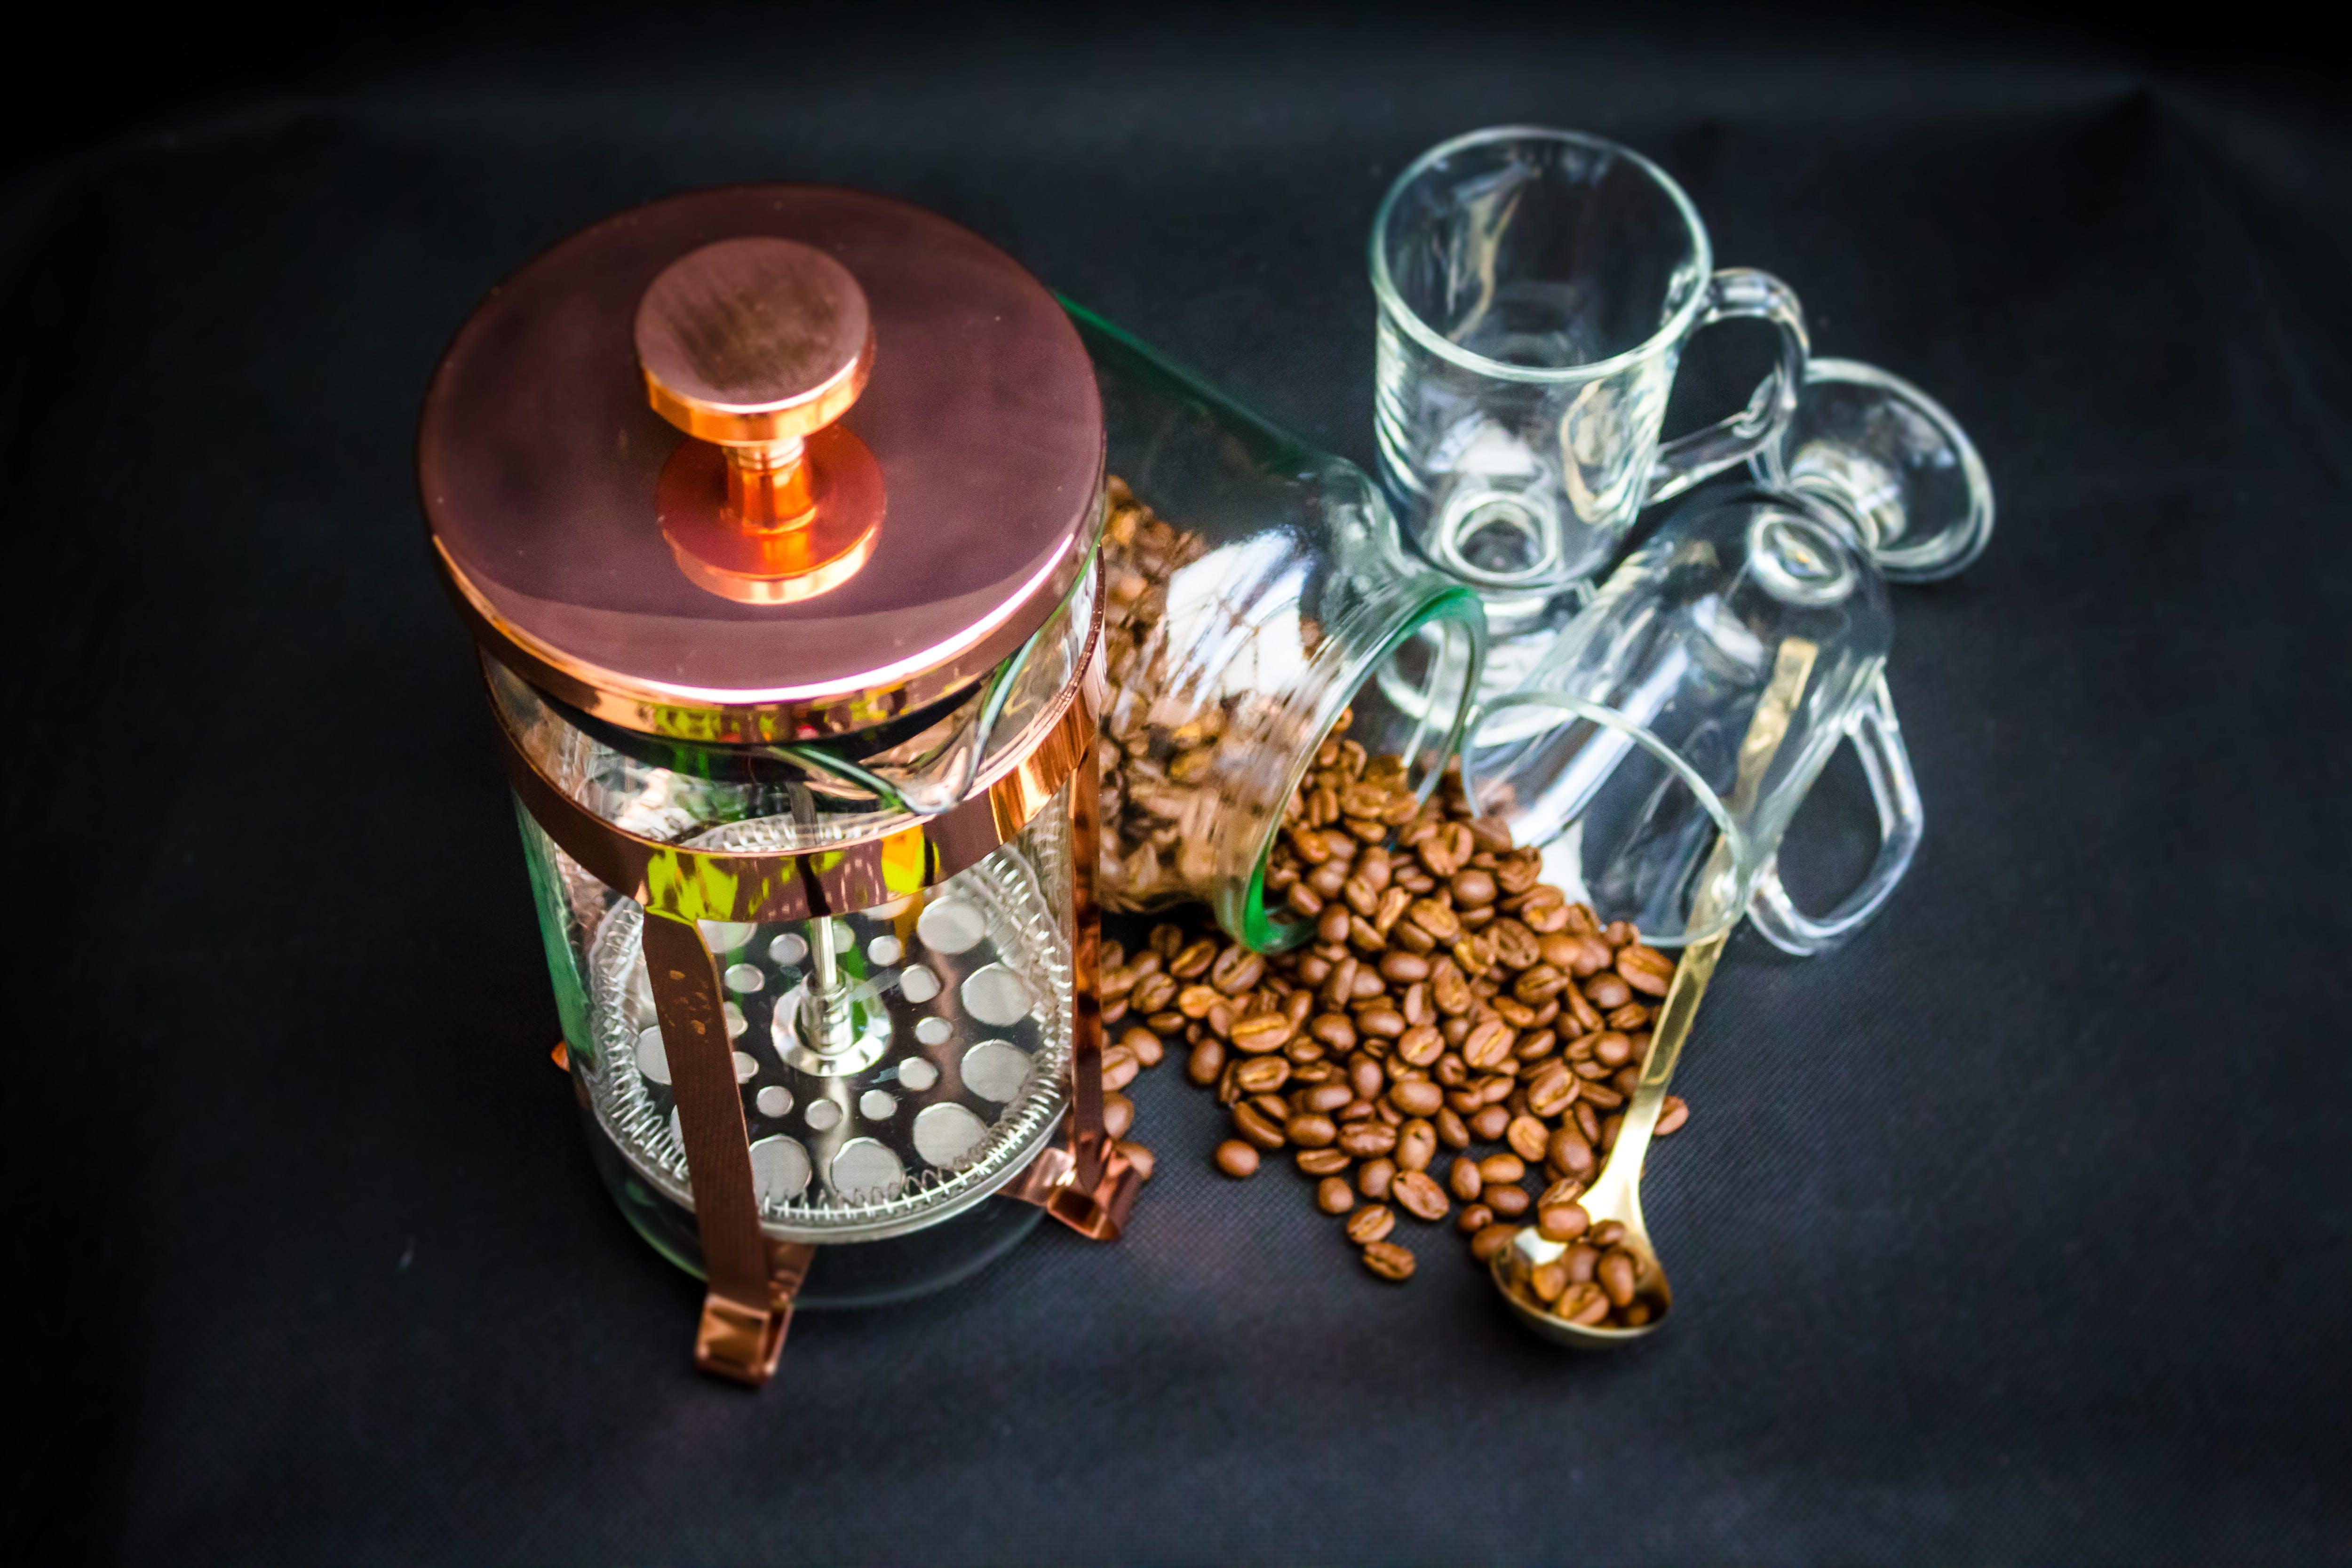 Free stock photo of coffee, coffee drink, coffee beans, brewed coffee